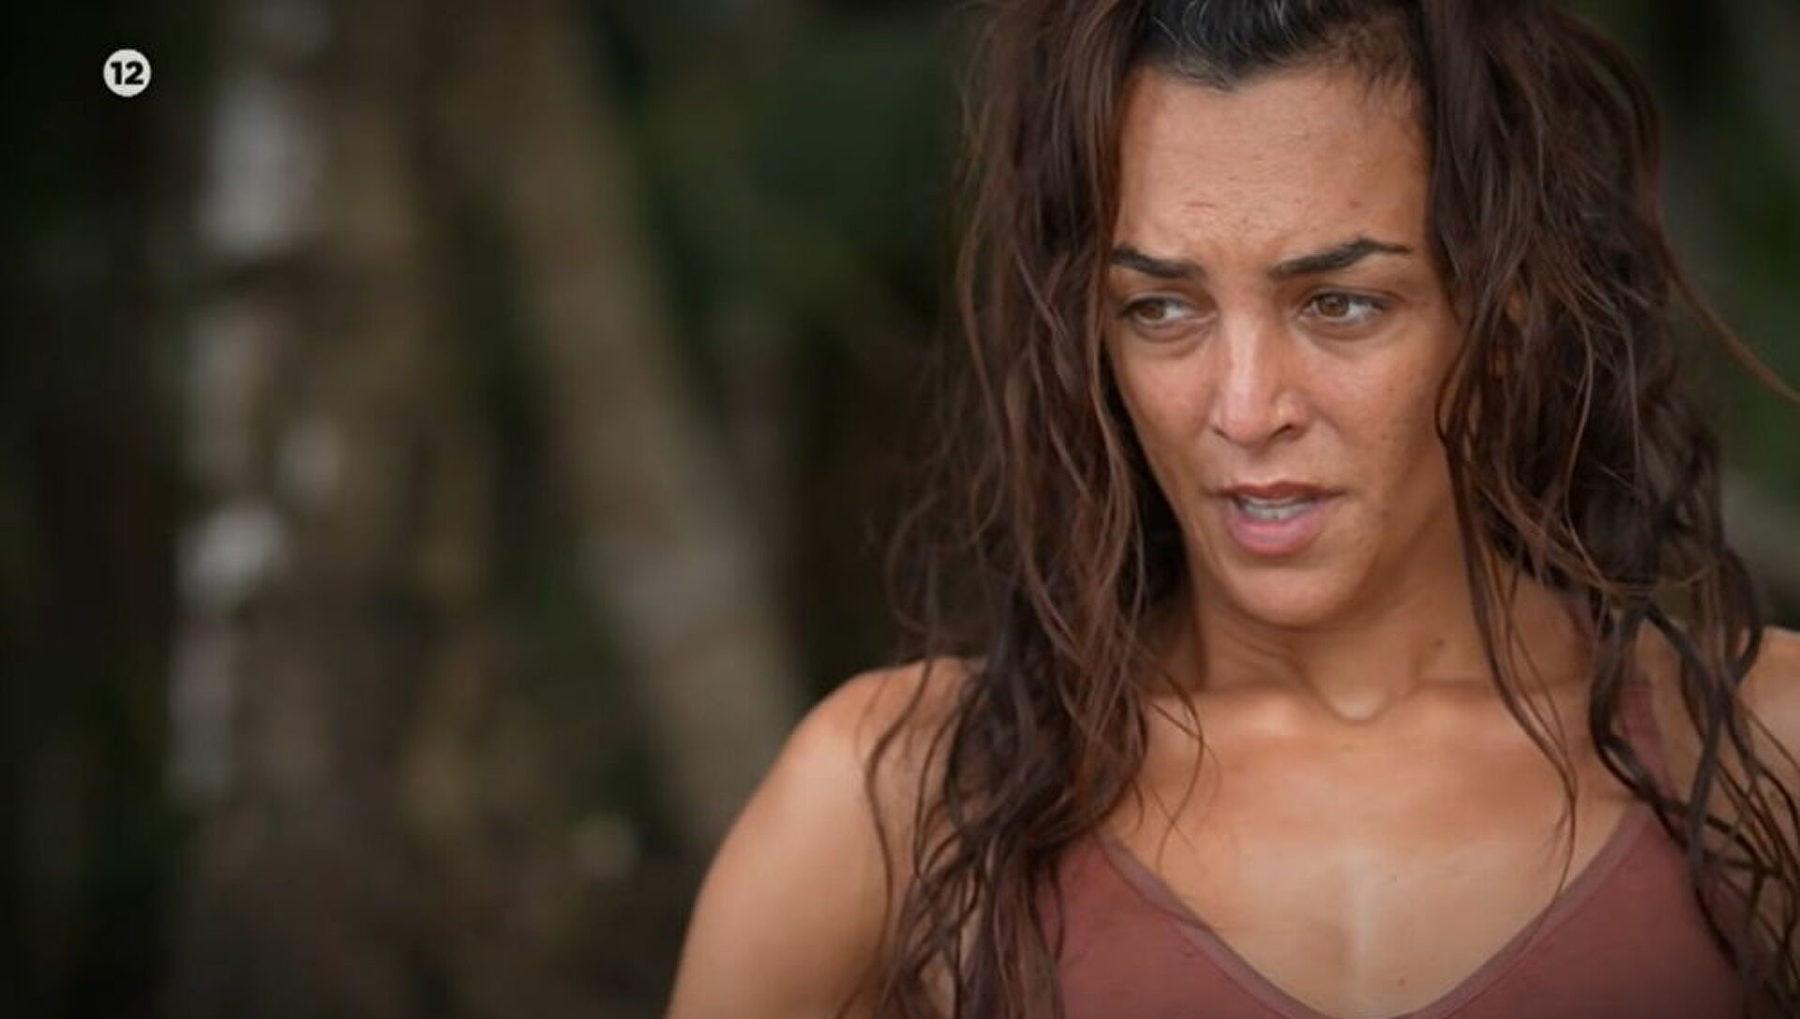 Survivor 4: Όλα όσα πρέπει να ξέρεις για την Καρολίνα Ζακλίν Καλύβα